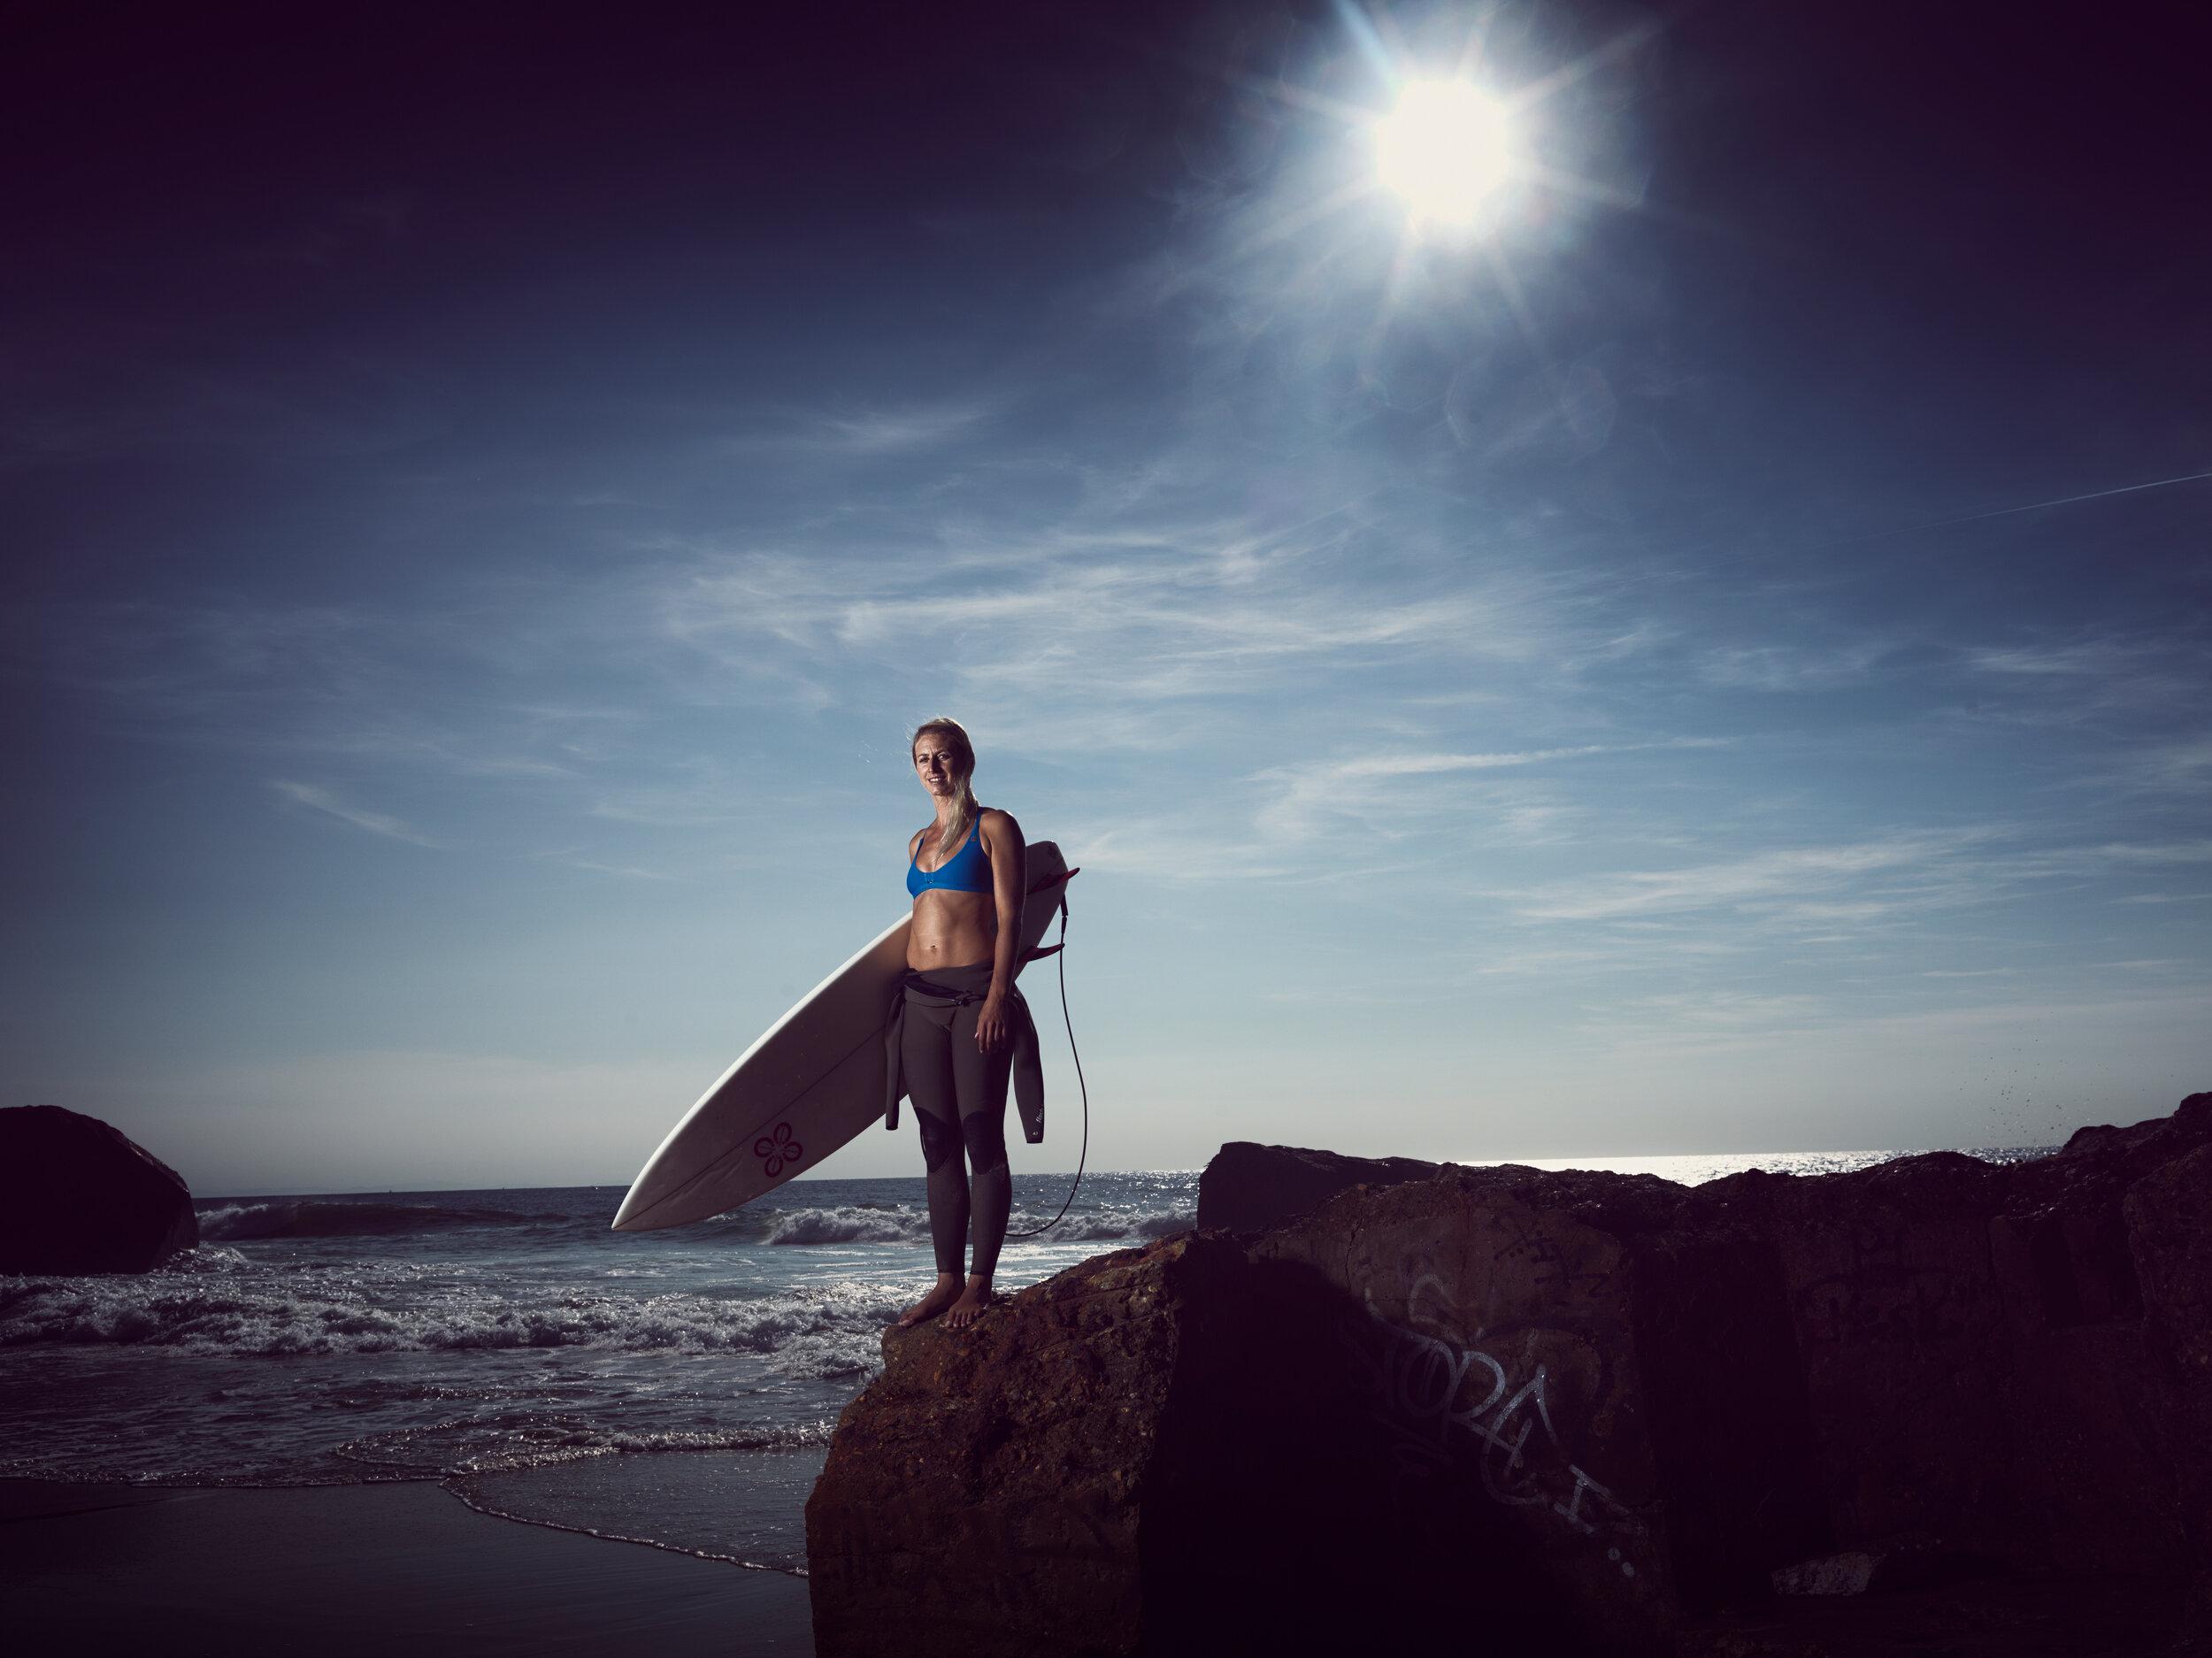 Surf_10.jpg